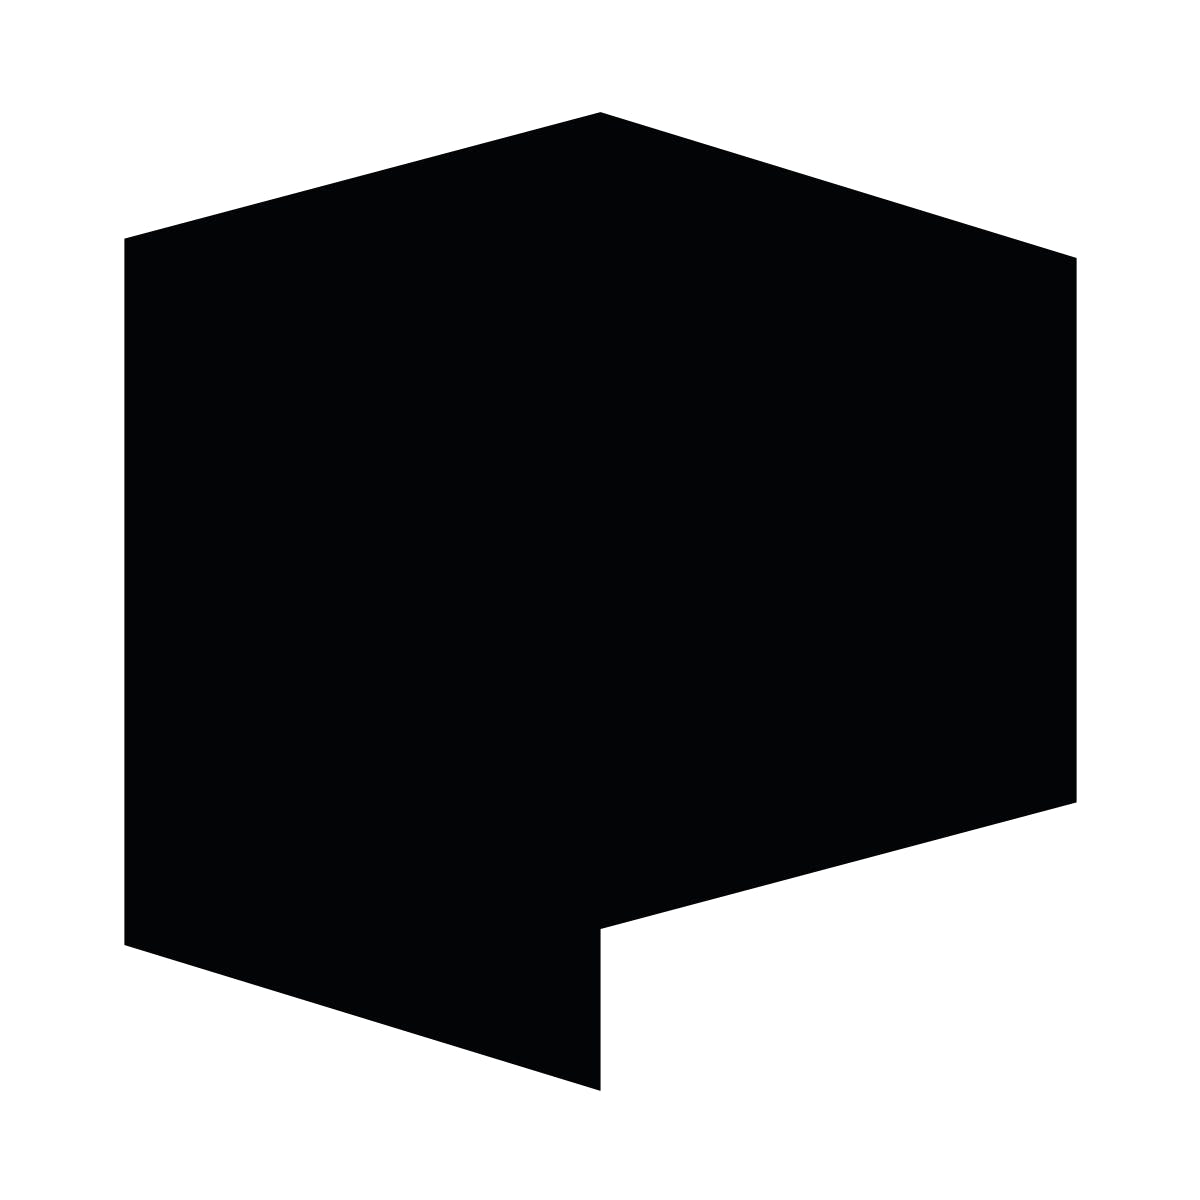 Webentwickler - Frontend | Backend | Fullstack (m/w/d)